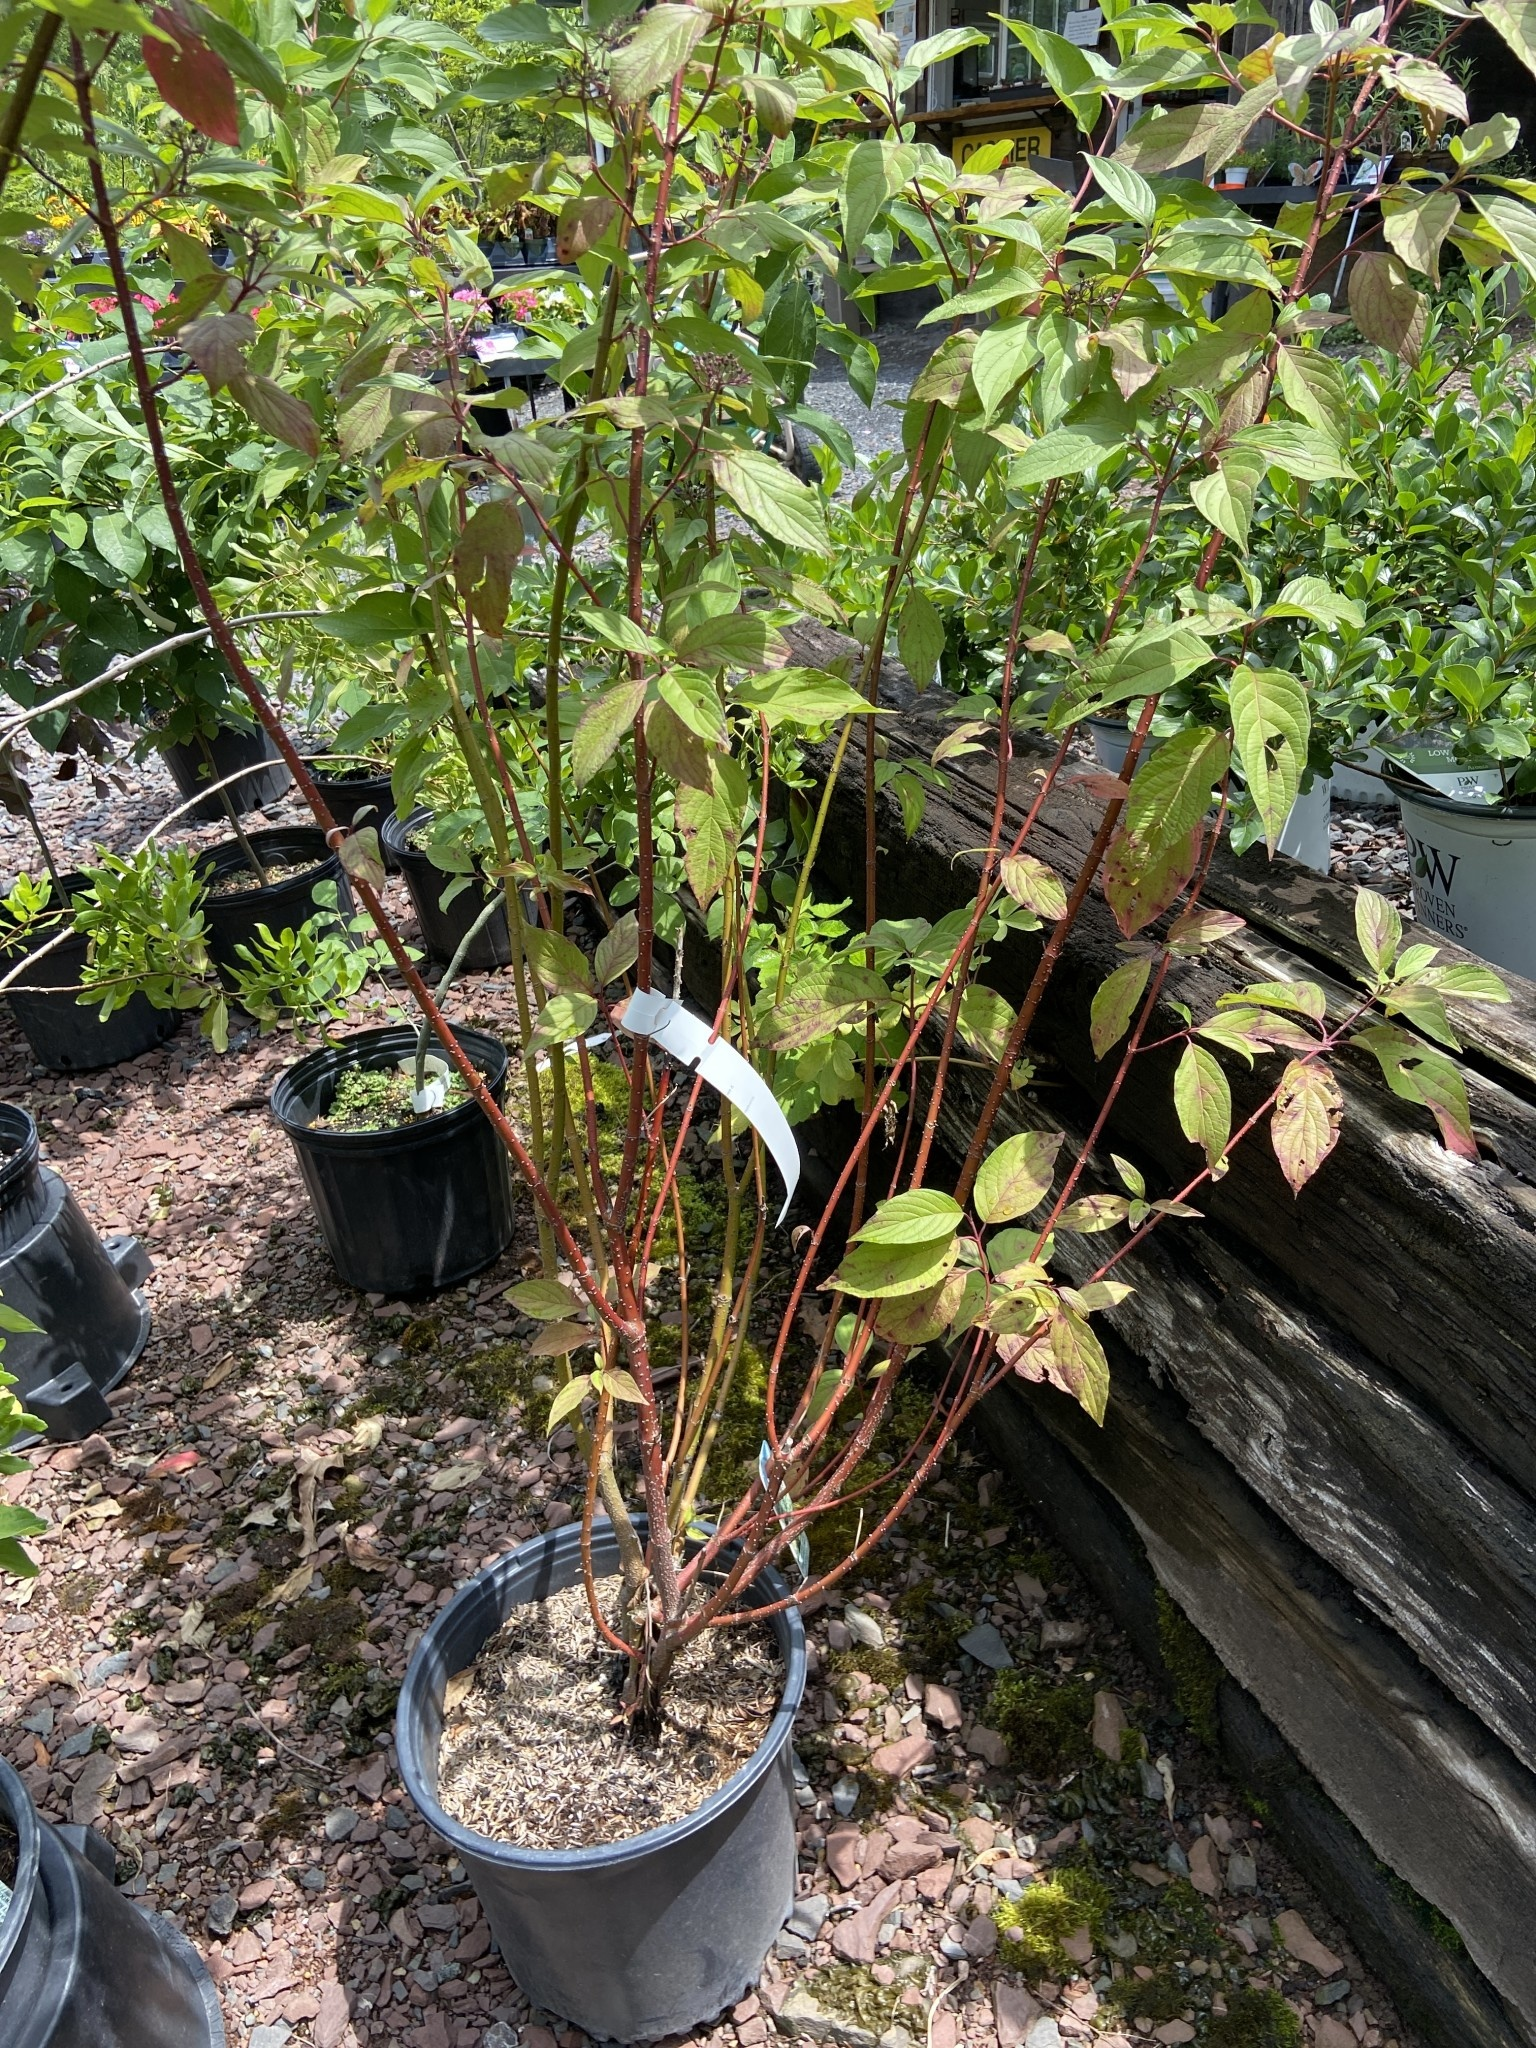 Cornus stolon. Baileyi Dogwood - Red Twig, Baileyi, #3